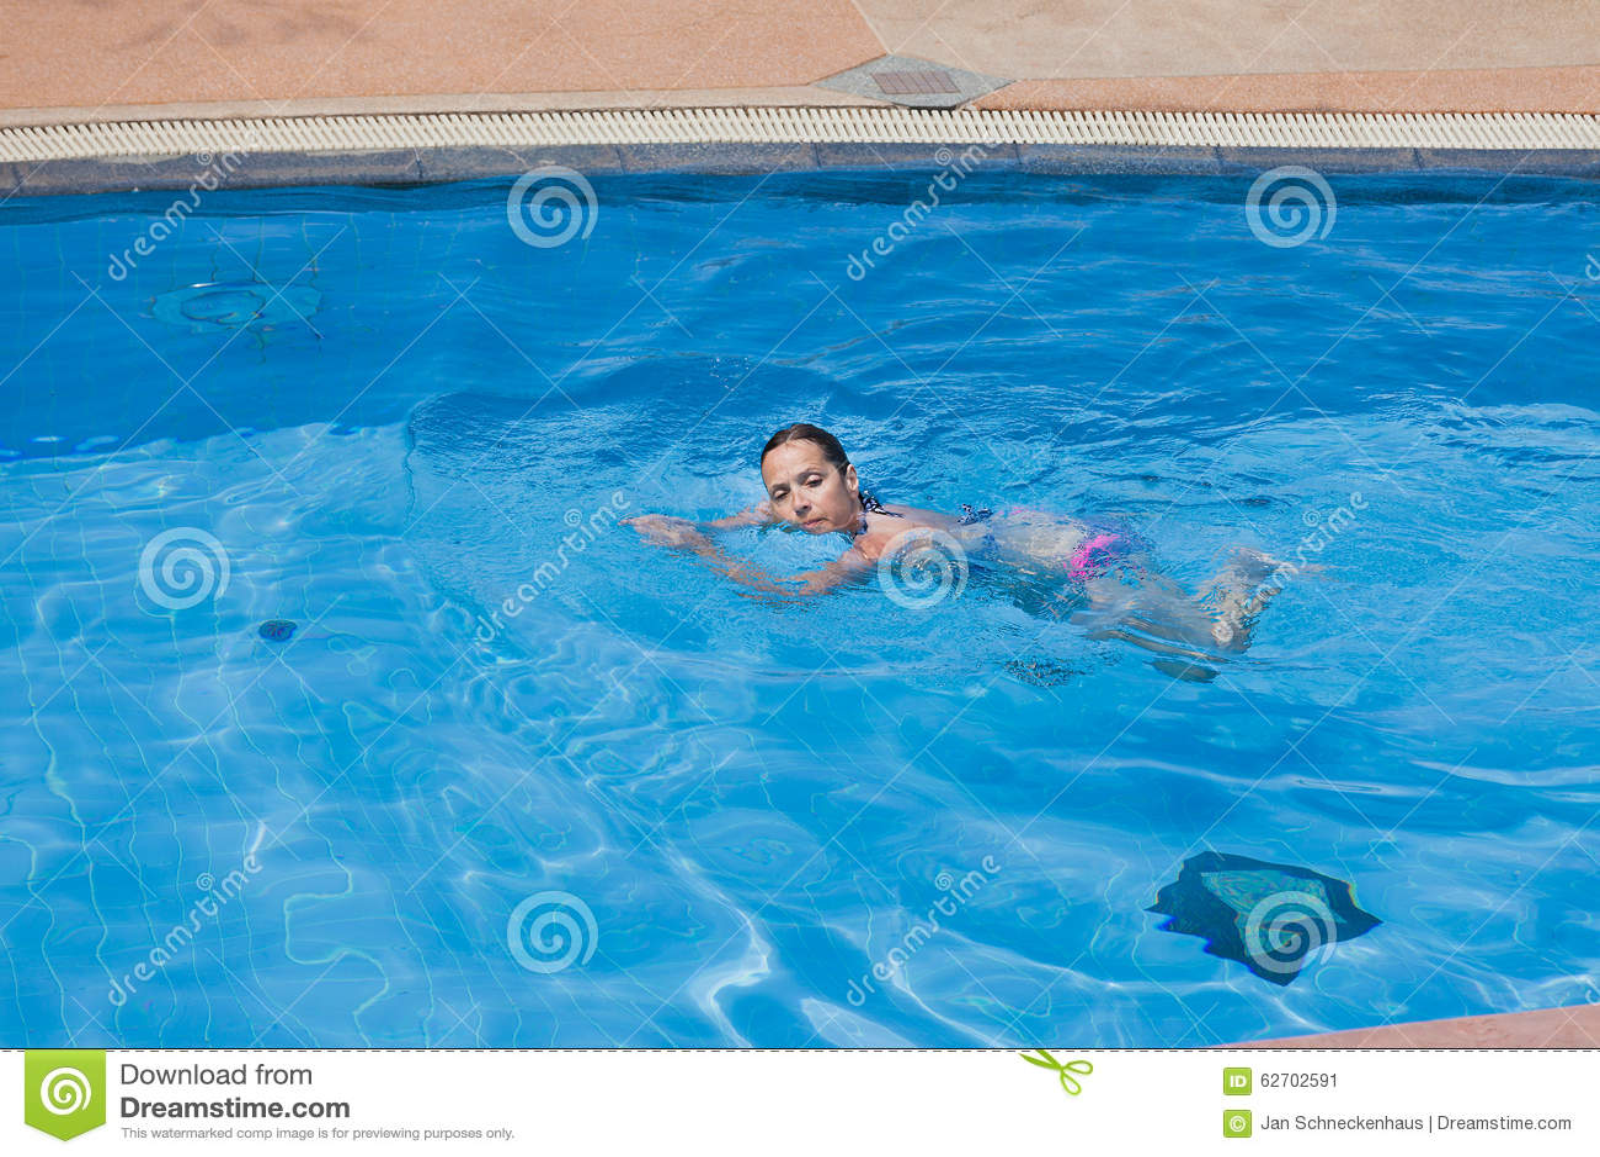 A Woman Swims Alone Stock Photo Image 62702591